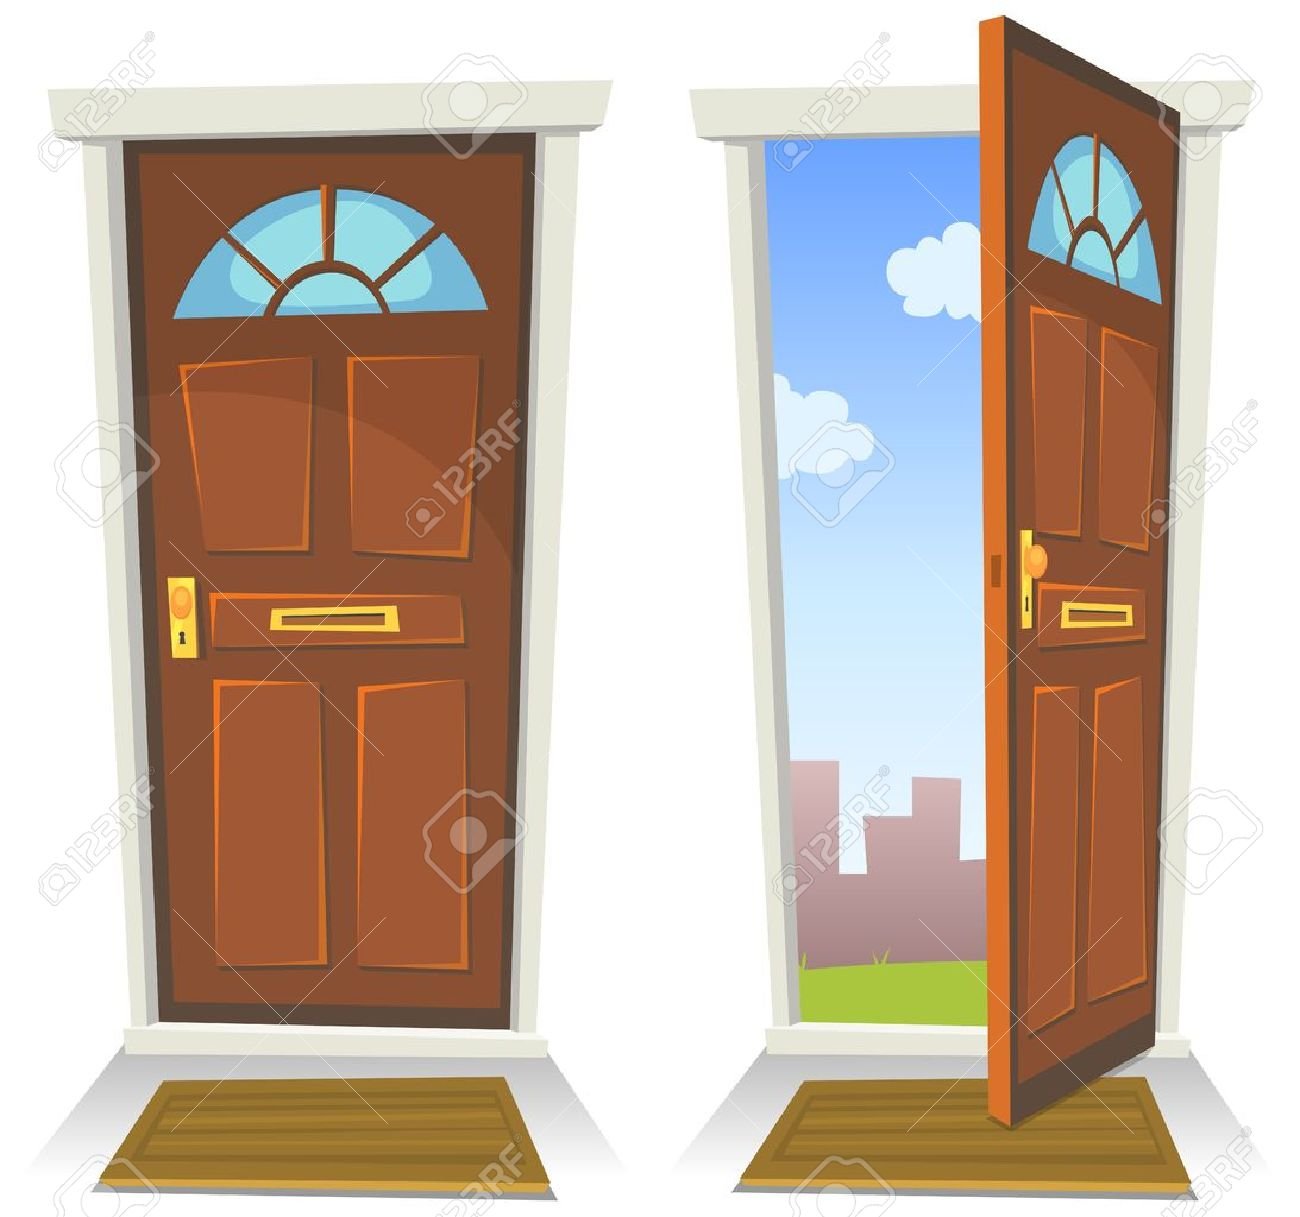 Open Front Door Welcome illustration of a cartoon front red door opened on a spring urban